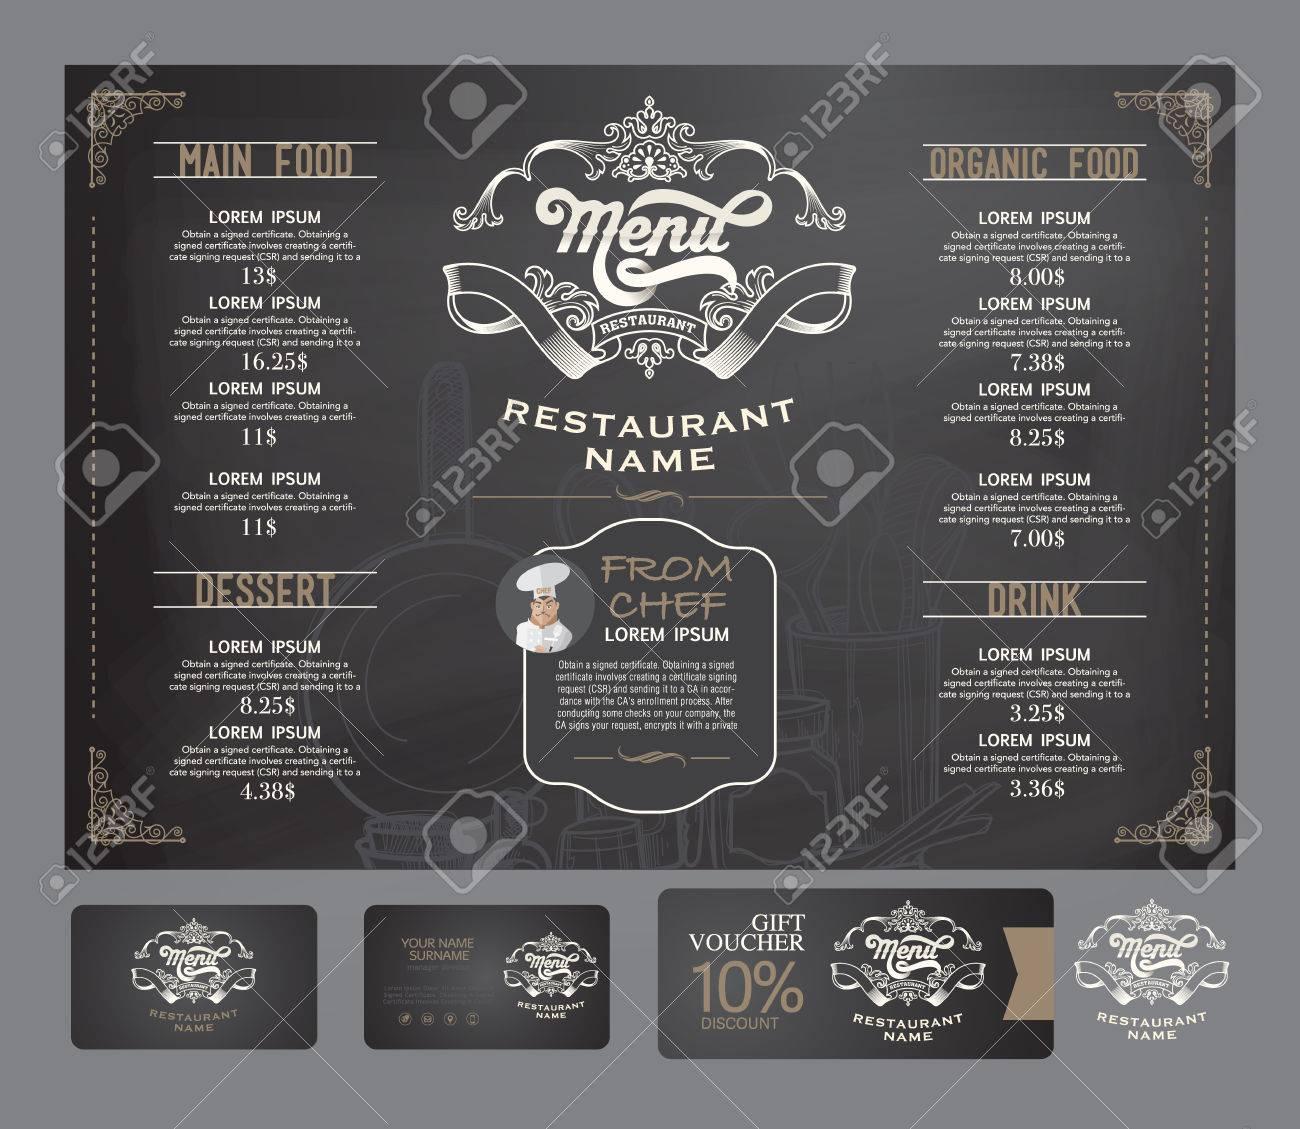 Vector restaurant menu template. - 52181042